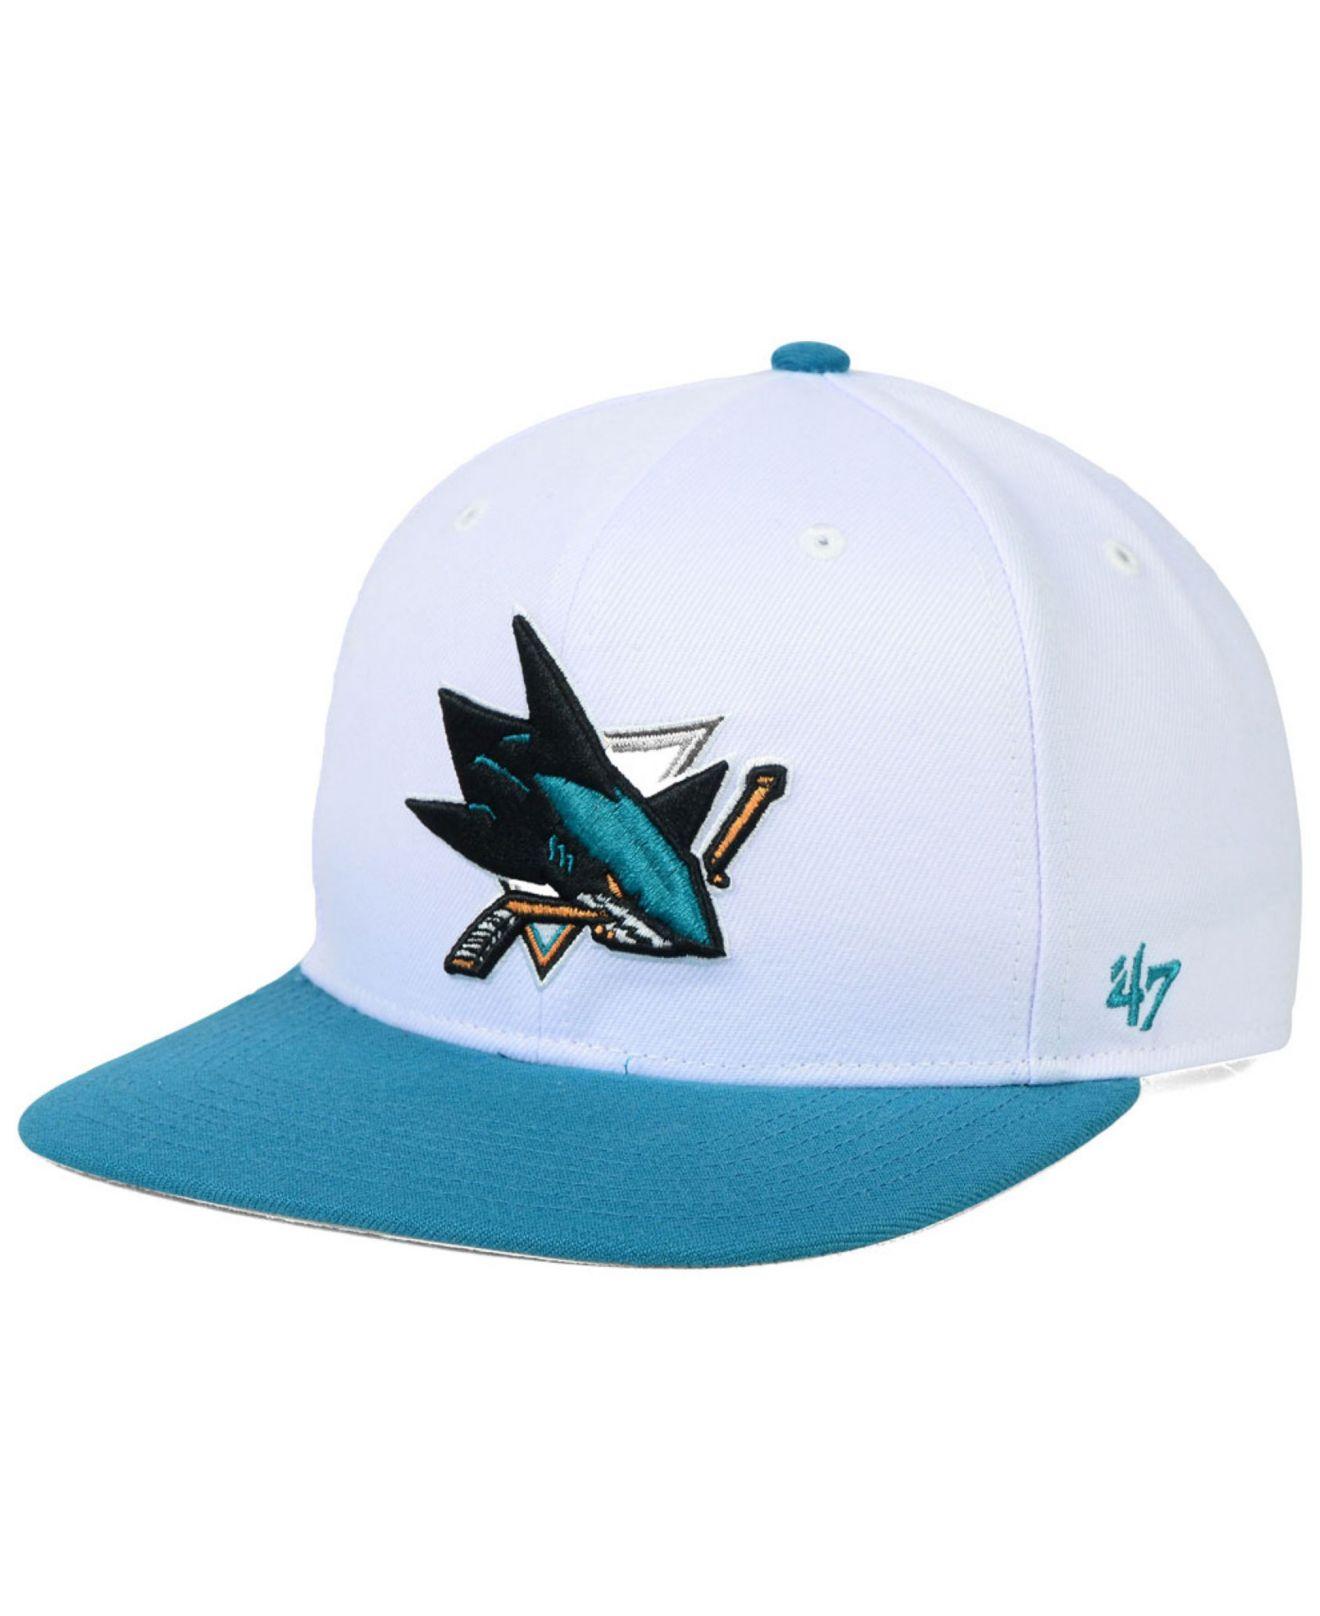 ea4a92a5baf5ef 47 Brand San Jose Sharks Sure Shot 2-tone Snapback Cap in White for Men -  Lyst